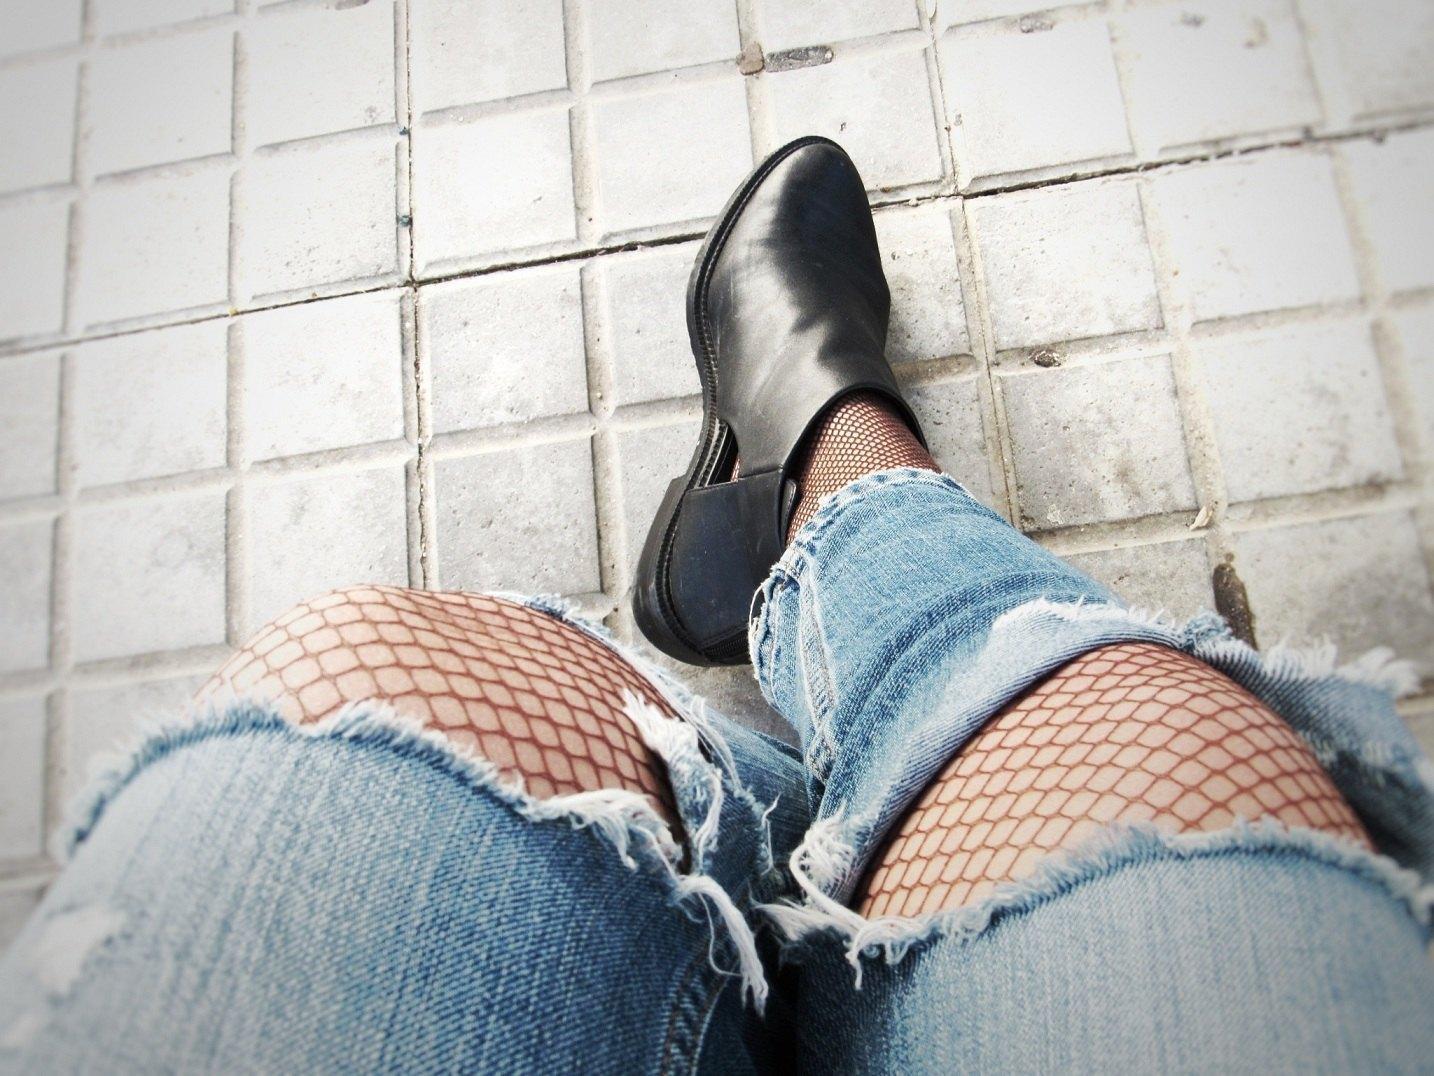 marikowskaya-street-style-patricia-ripped-jeans-3